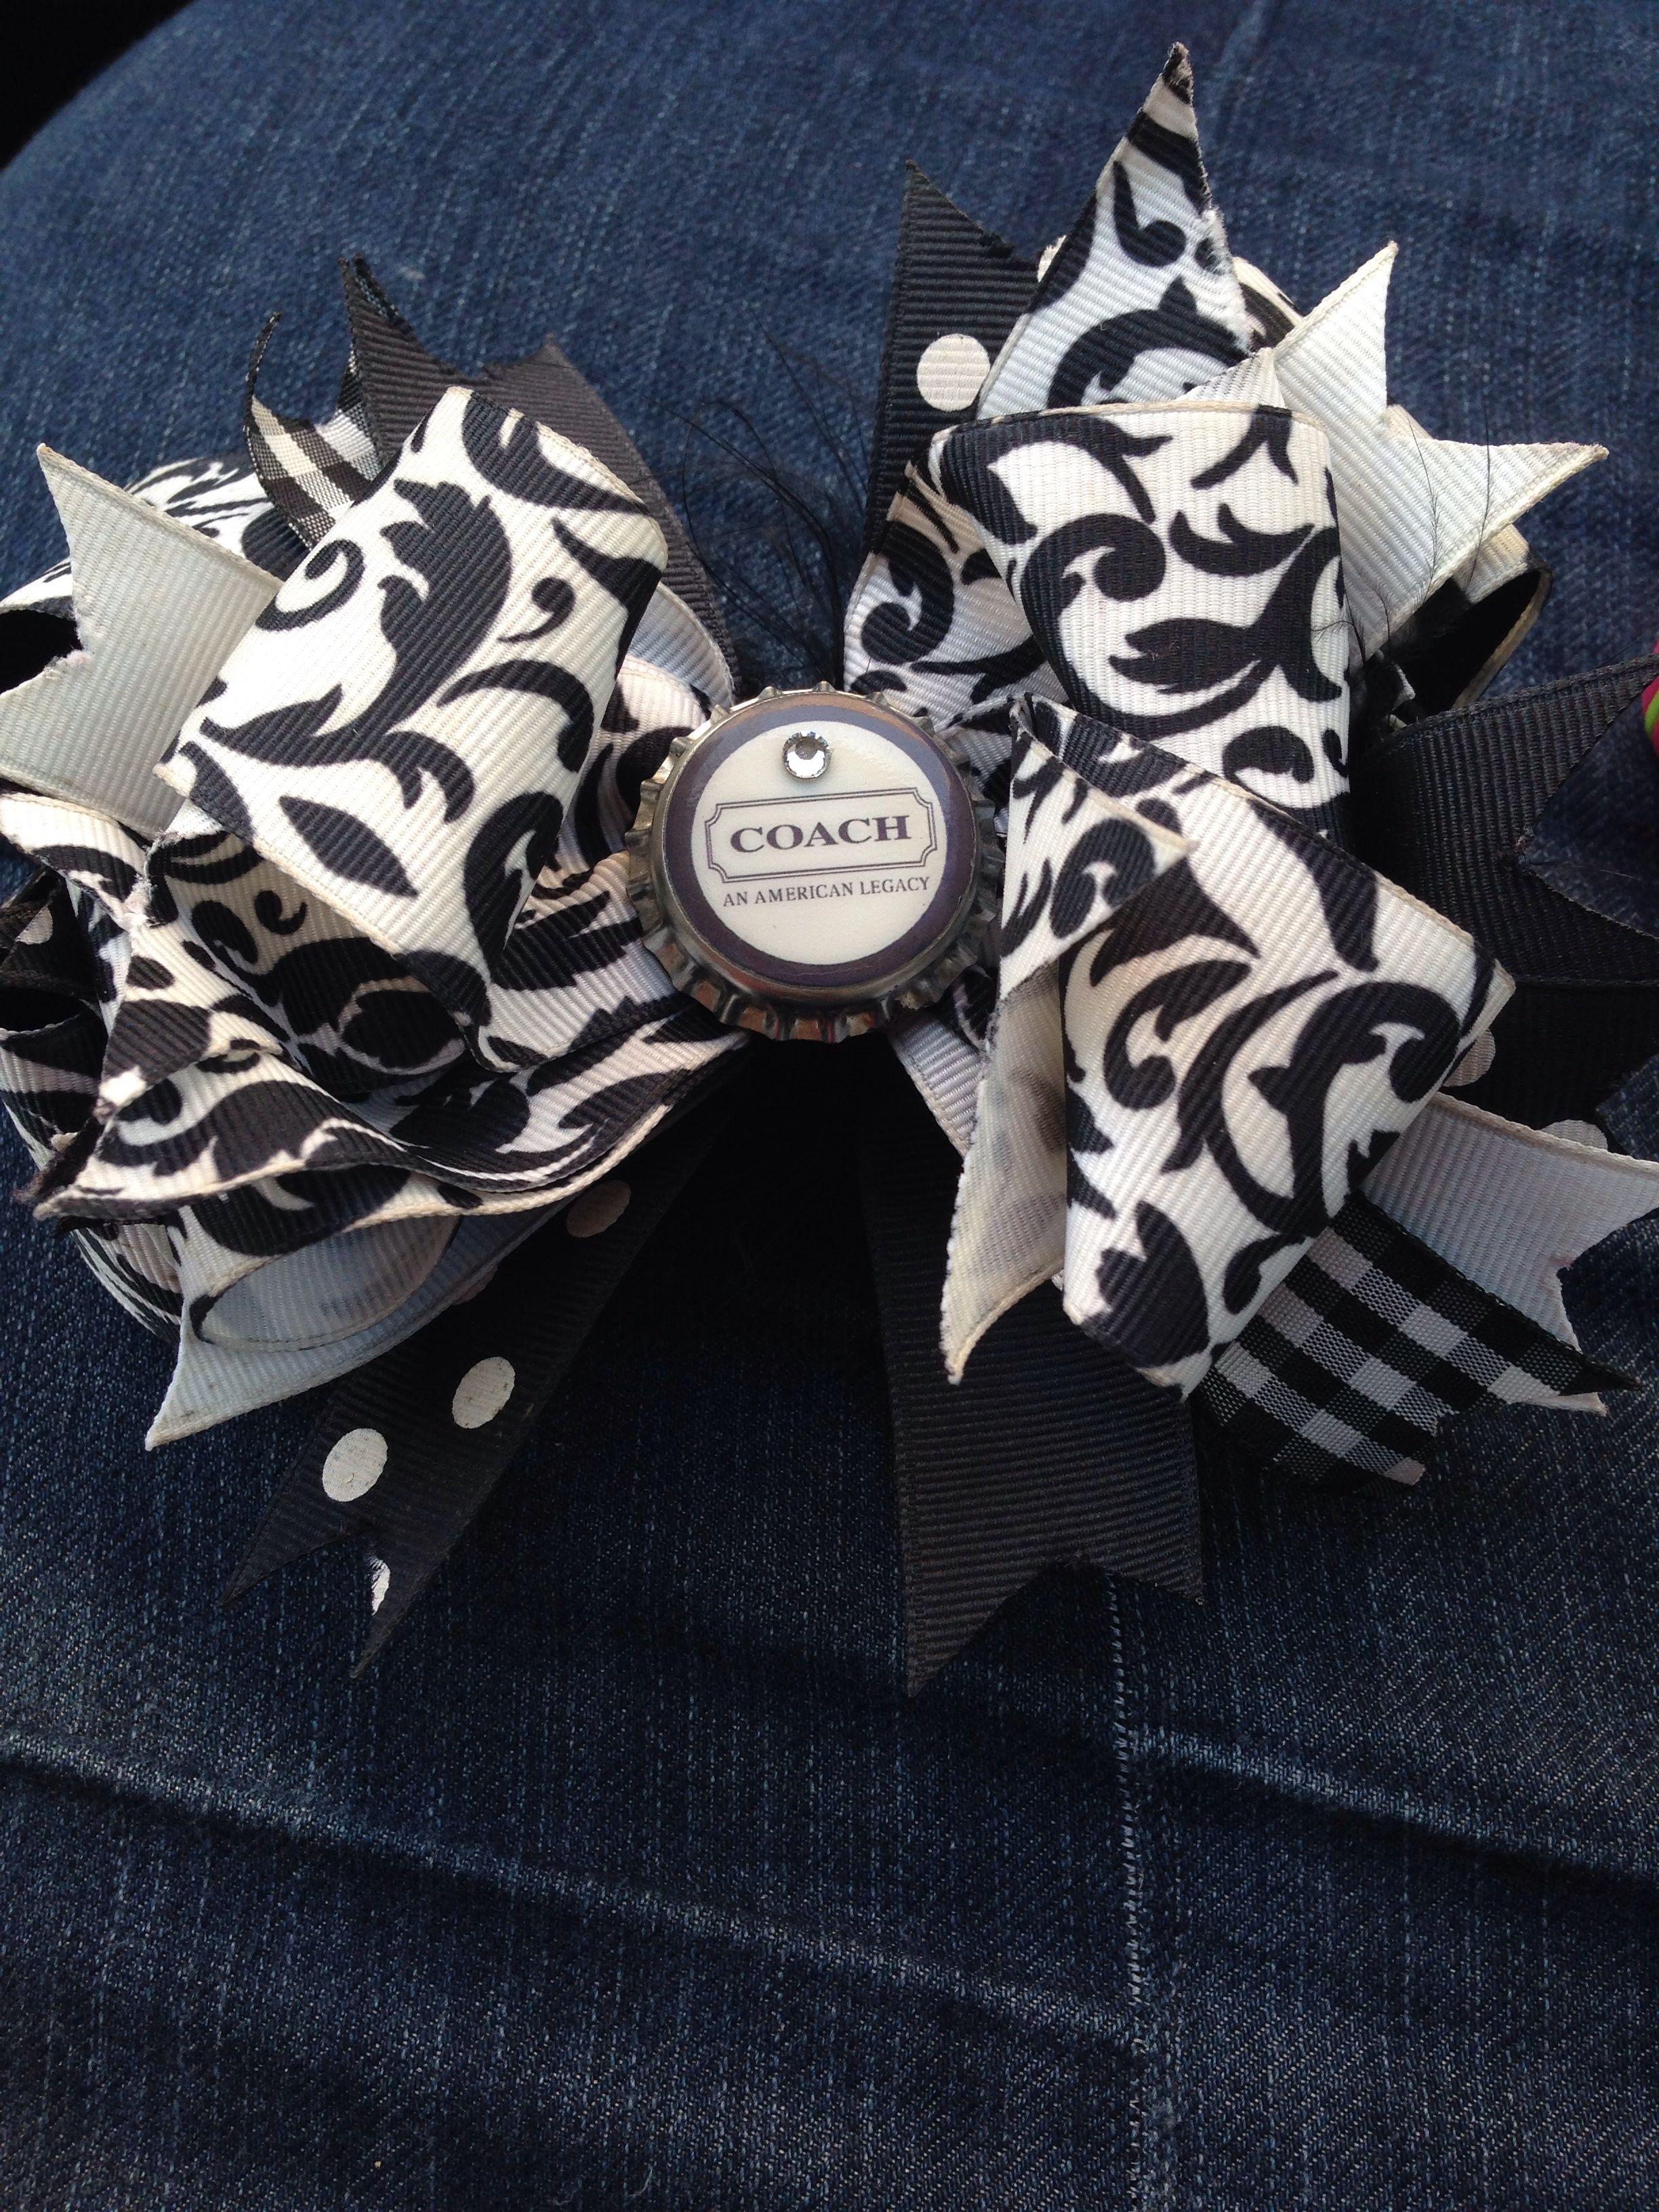 DIY homeade coach hair bow  2 Thin ribbons white & black 2 thick